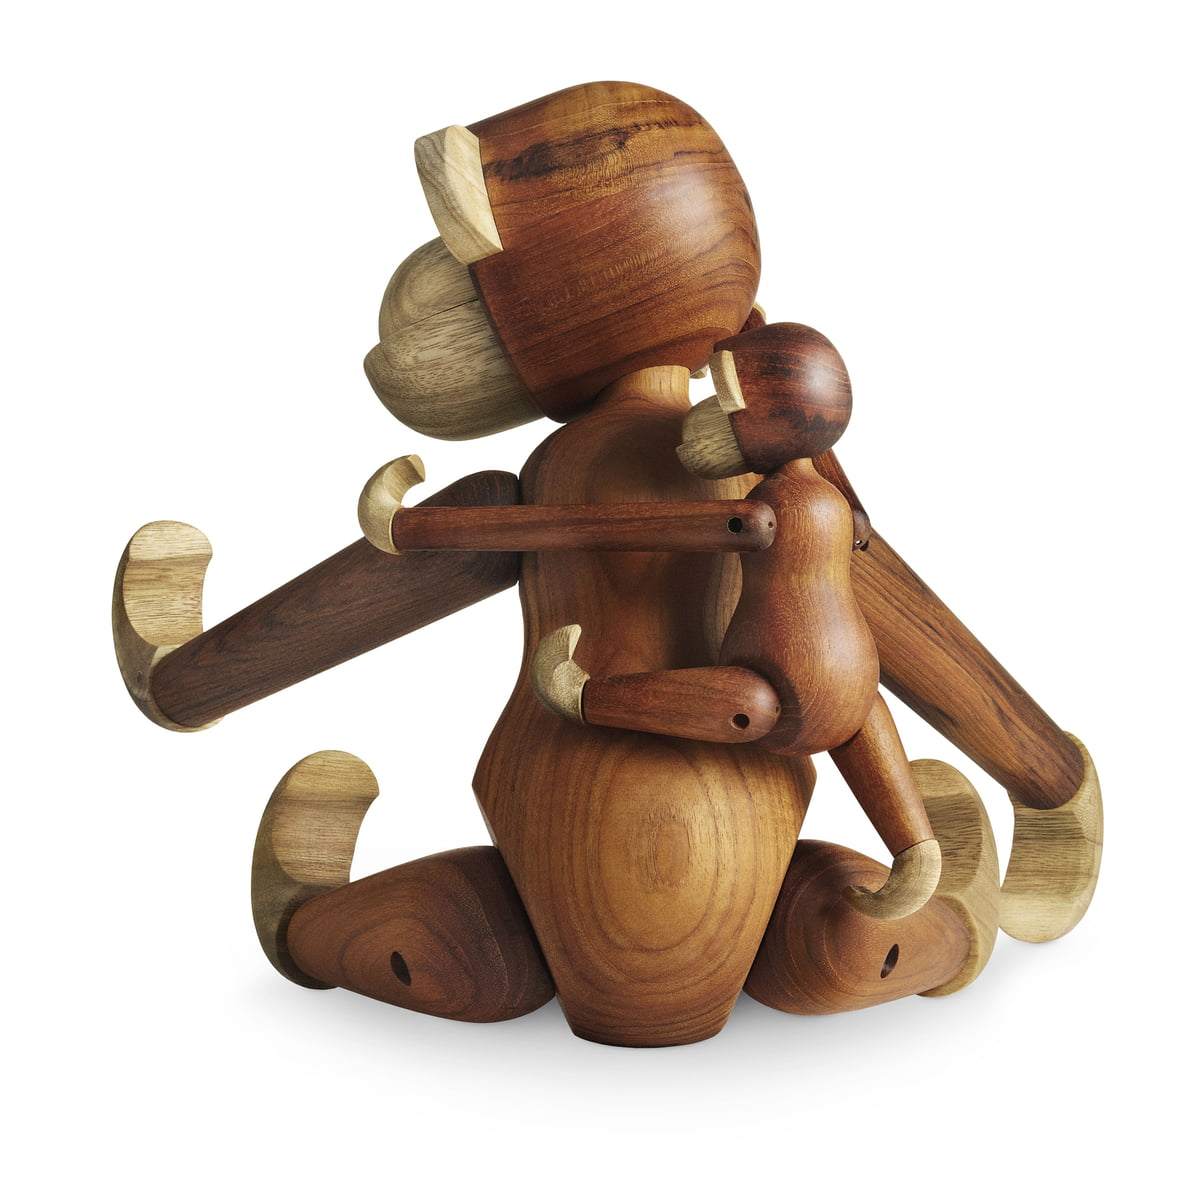 Kay Bojesen Wooden Monkey Small Limbo Wood Teak Wood